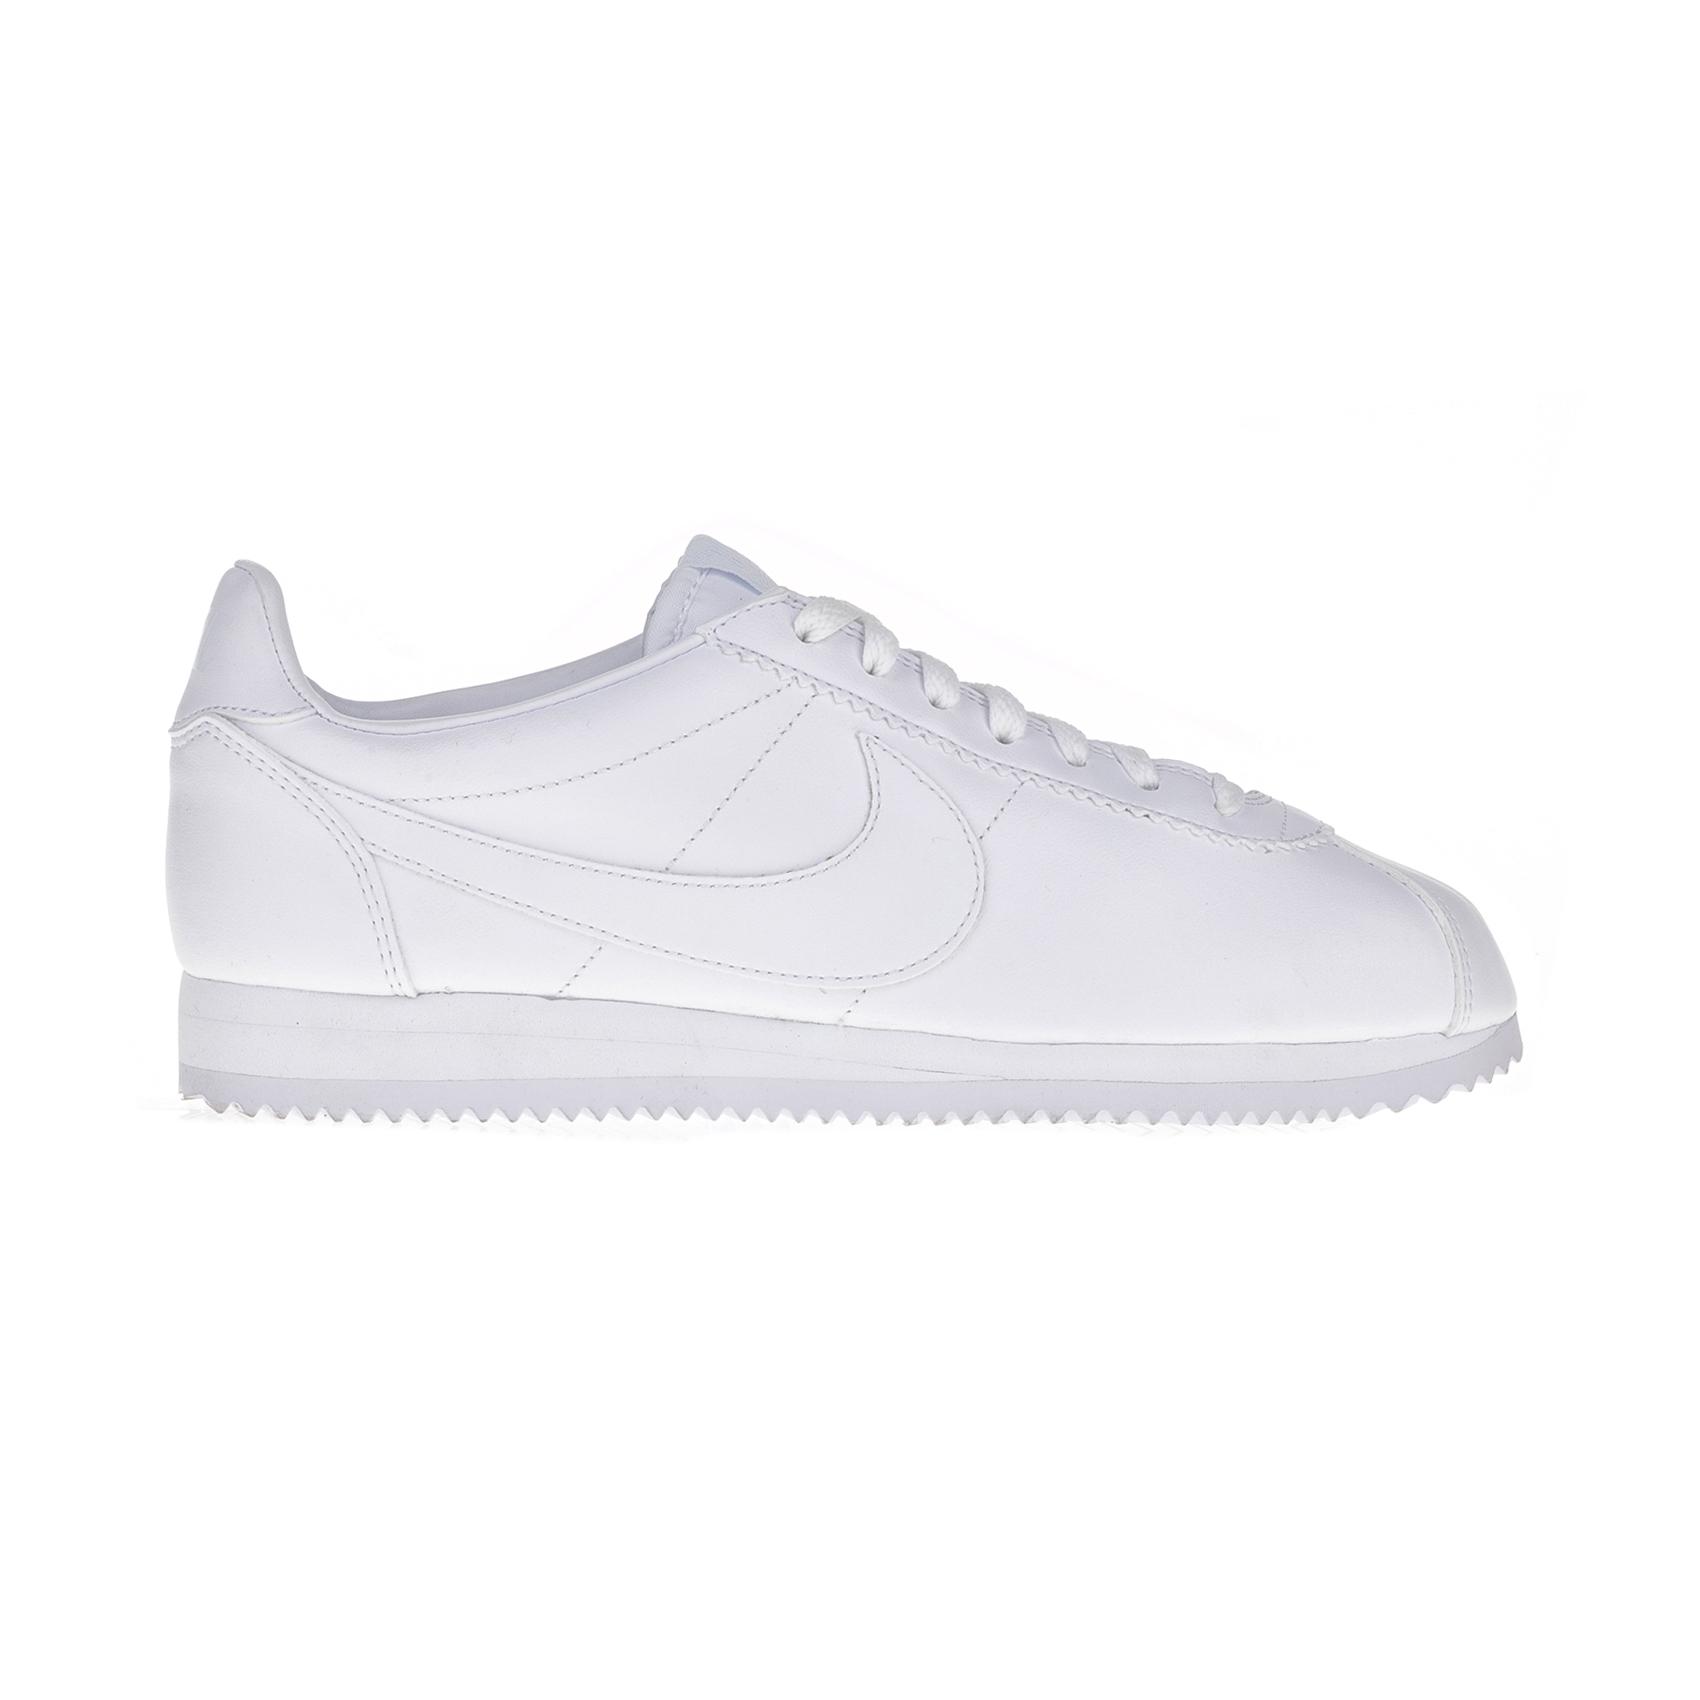 NIKE – Γυναικεία παπούτσια Nike CLASSIC CORTEZ LEATHER λευκά